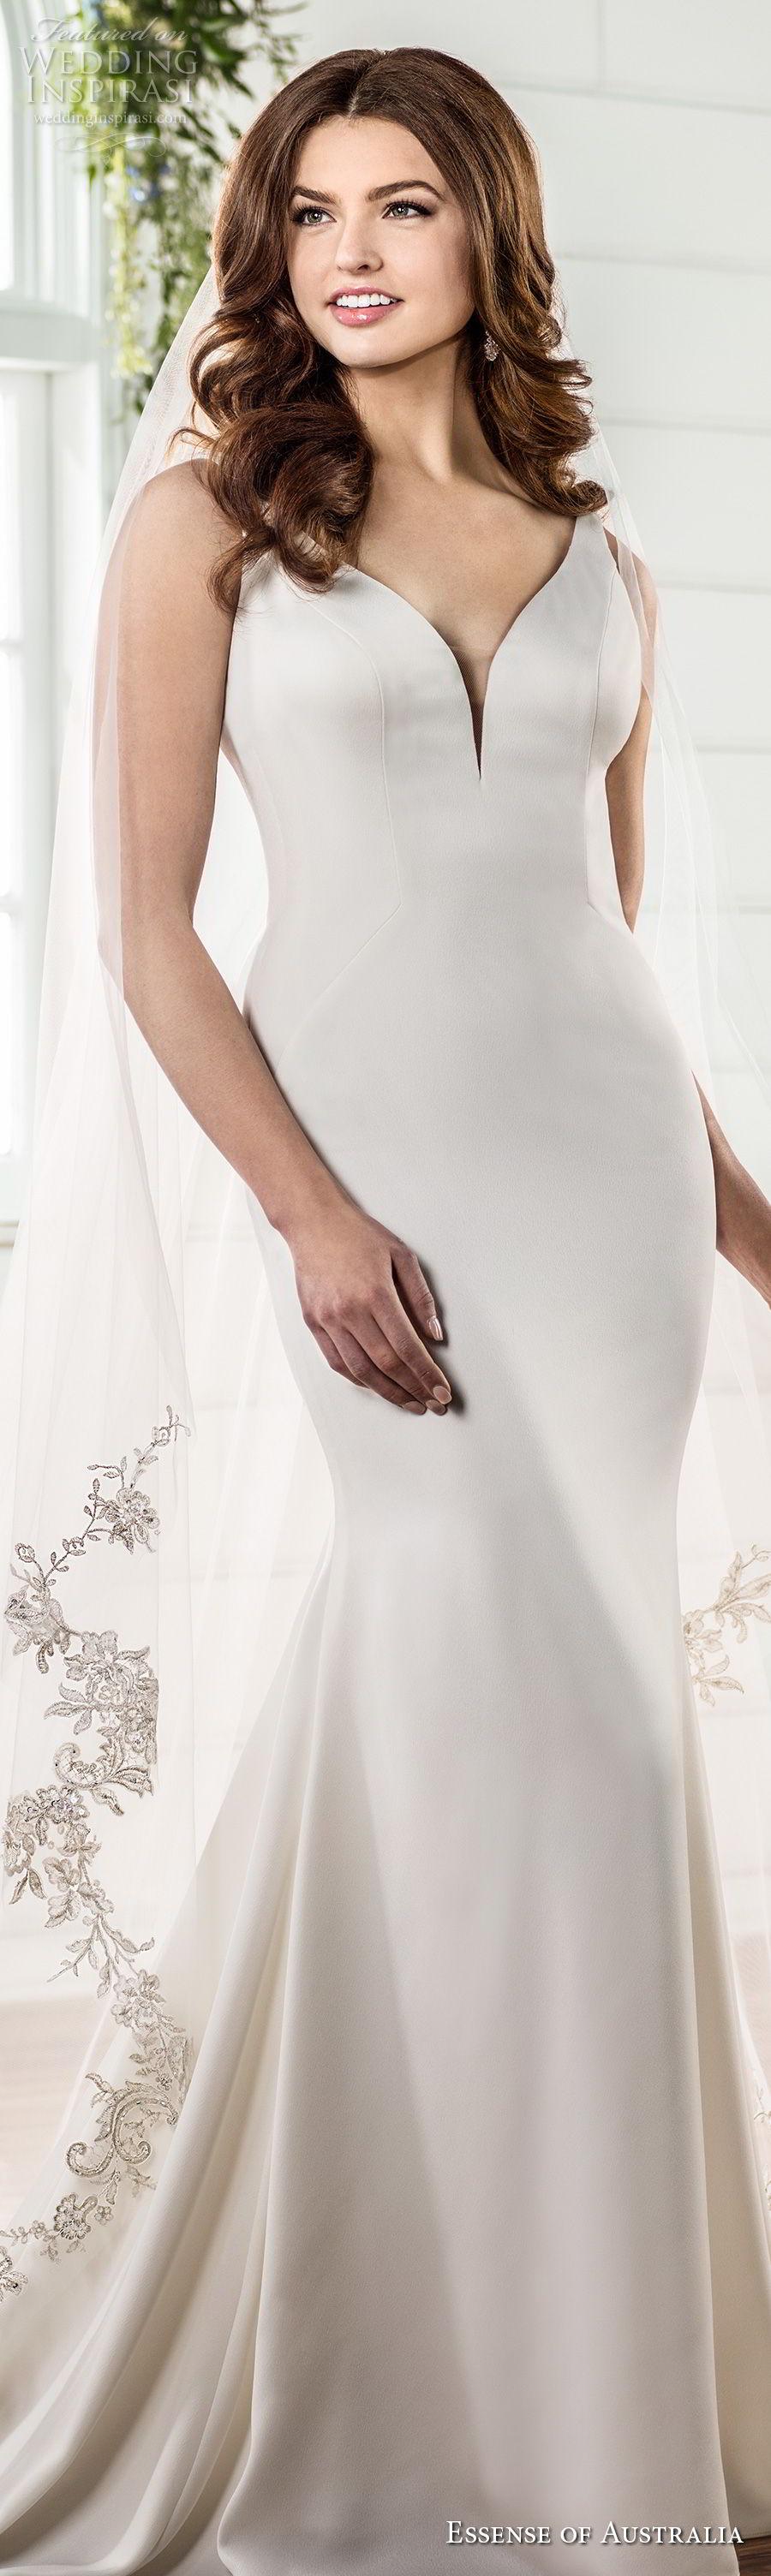 Essense Of Australia Wedding Dresses 94 Luxury essense australia fall bridal